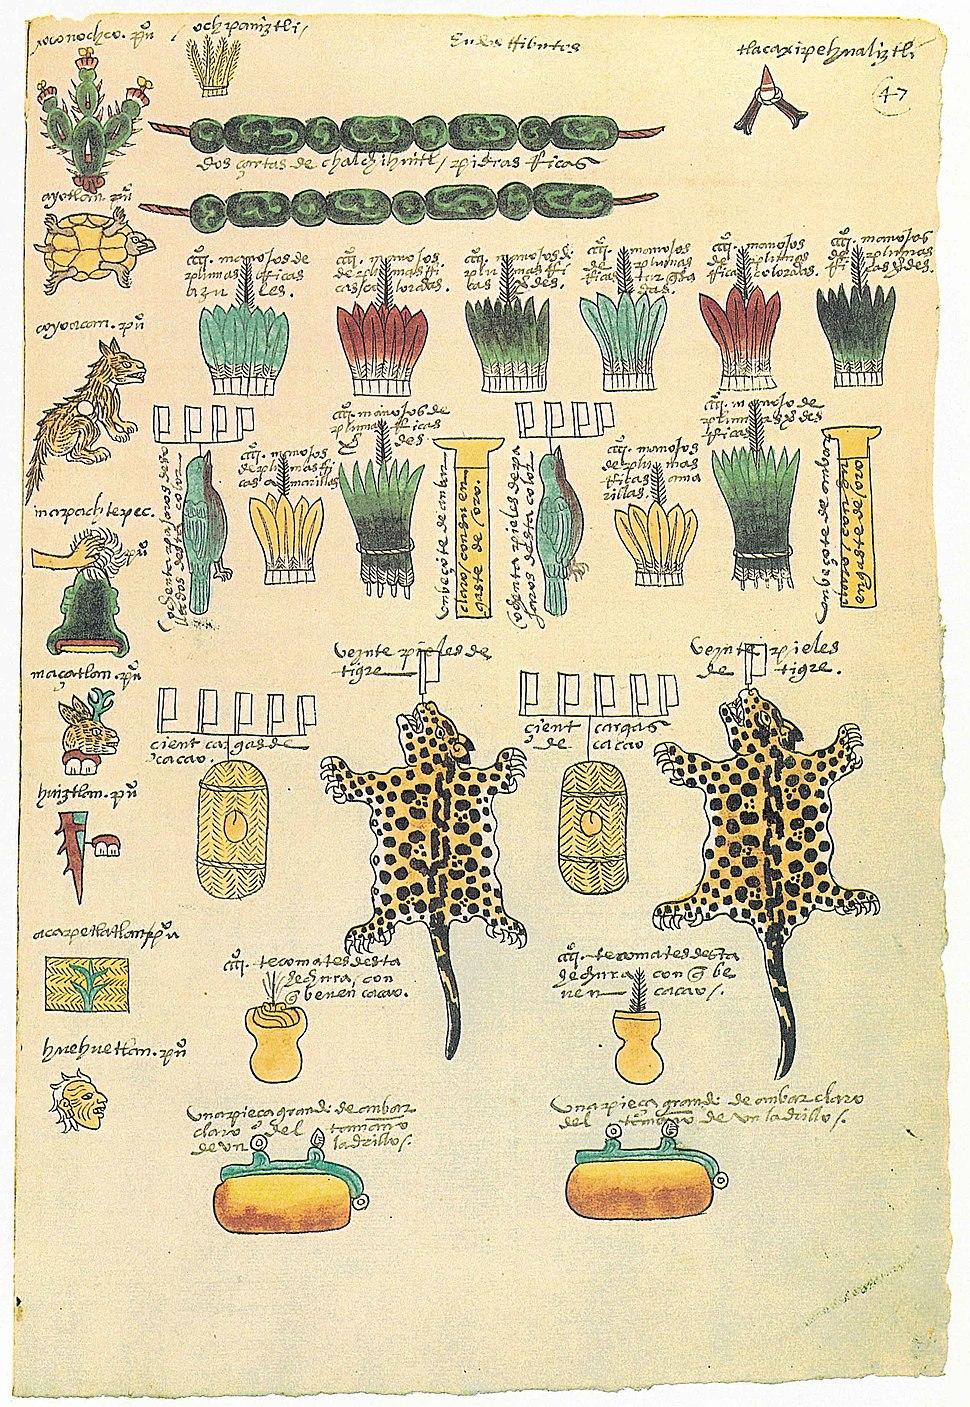 Codex Mendoza folio 47r